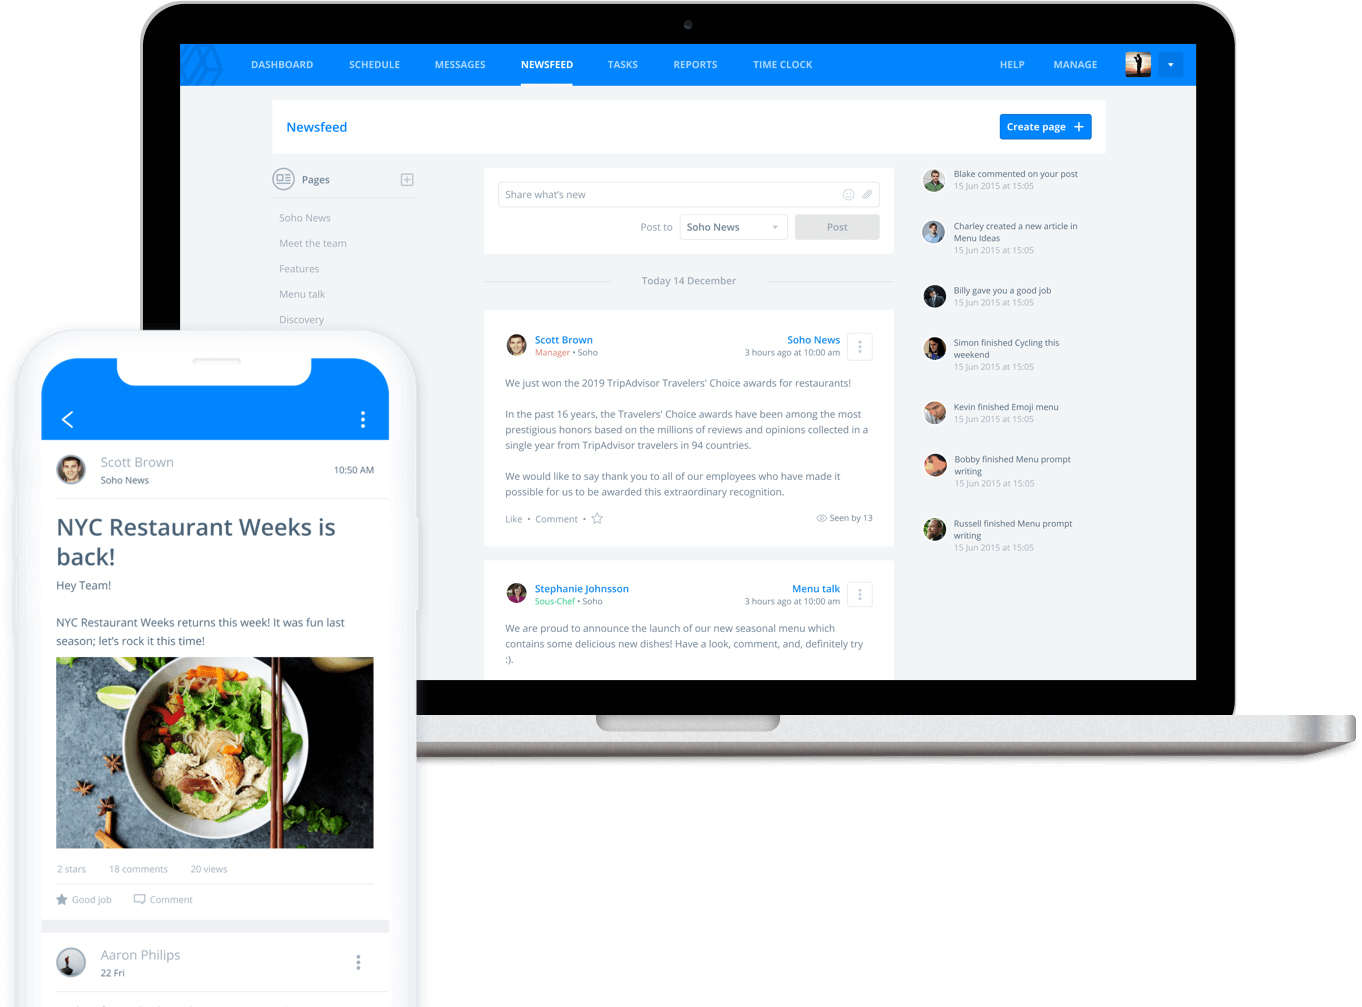 Screenshot of Sling contact employees app